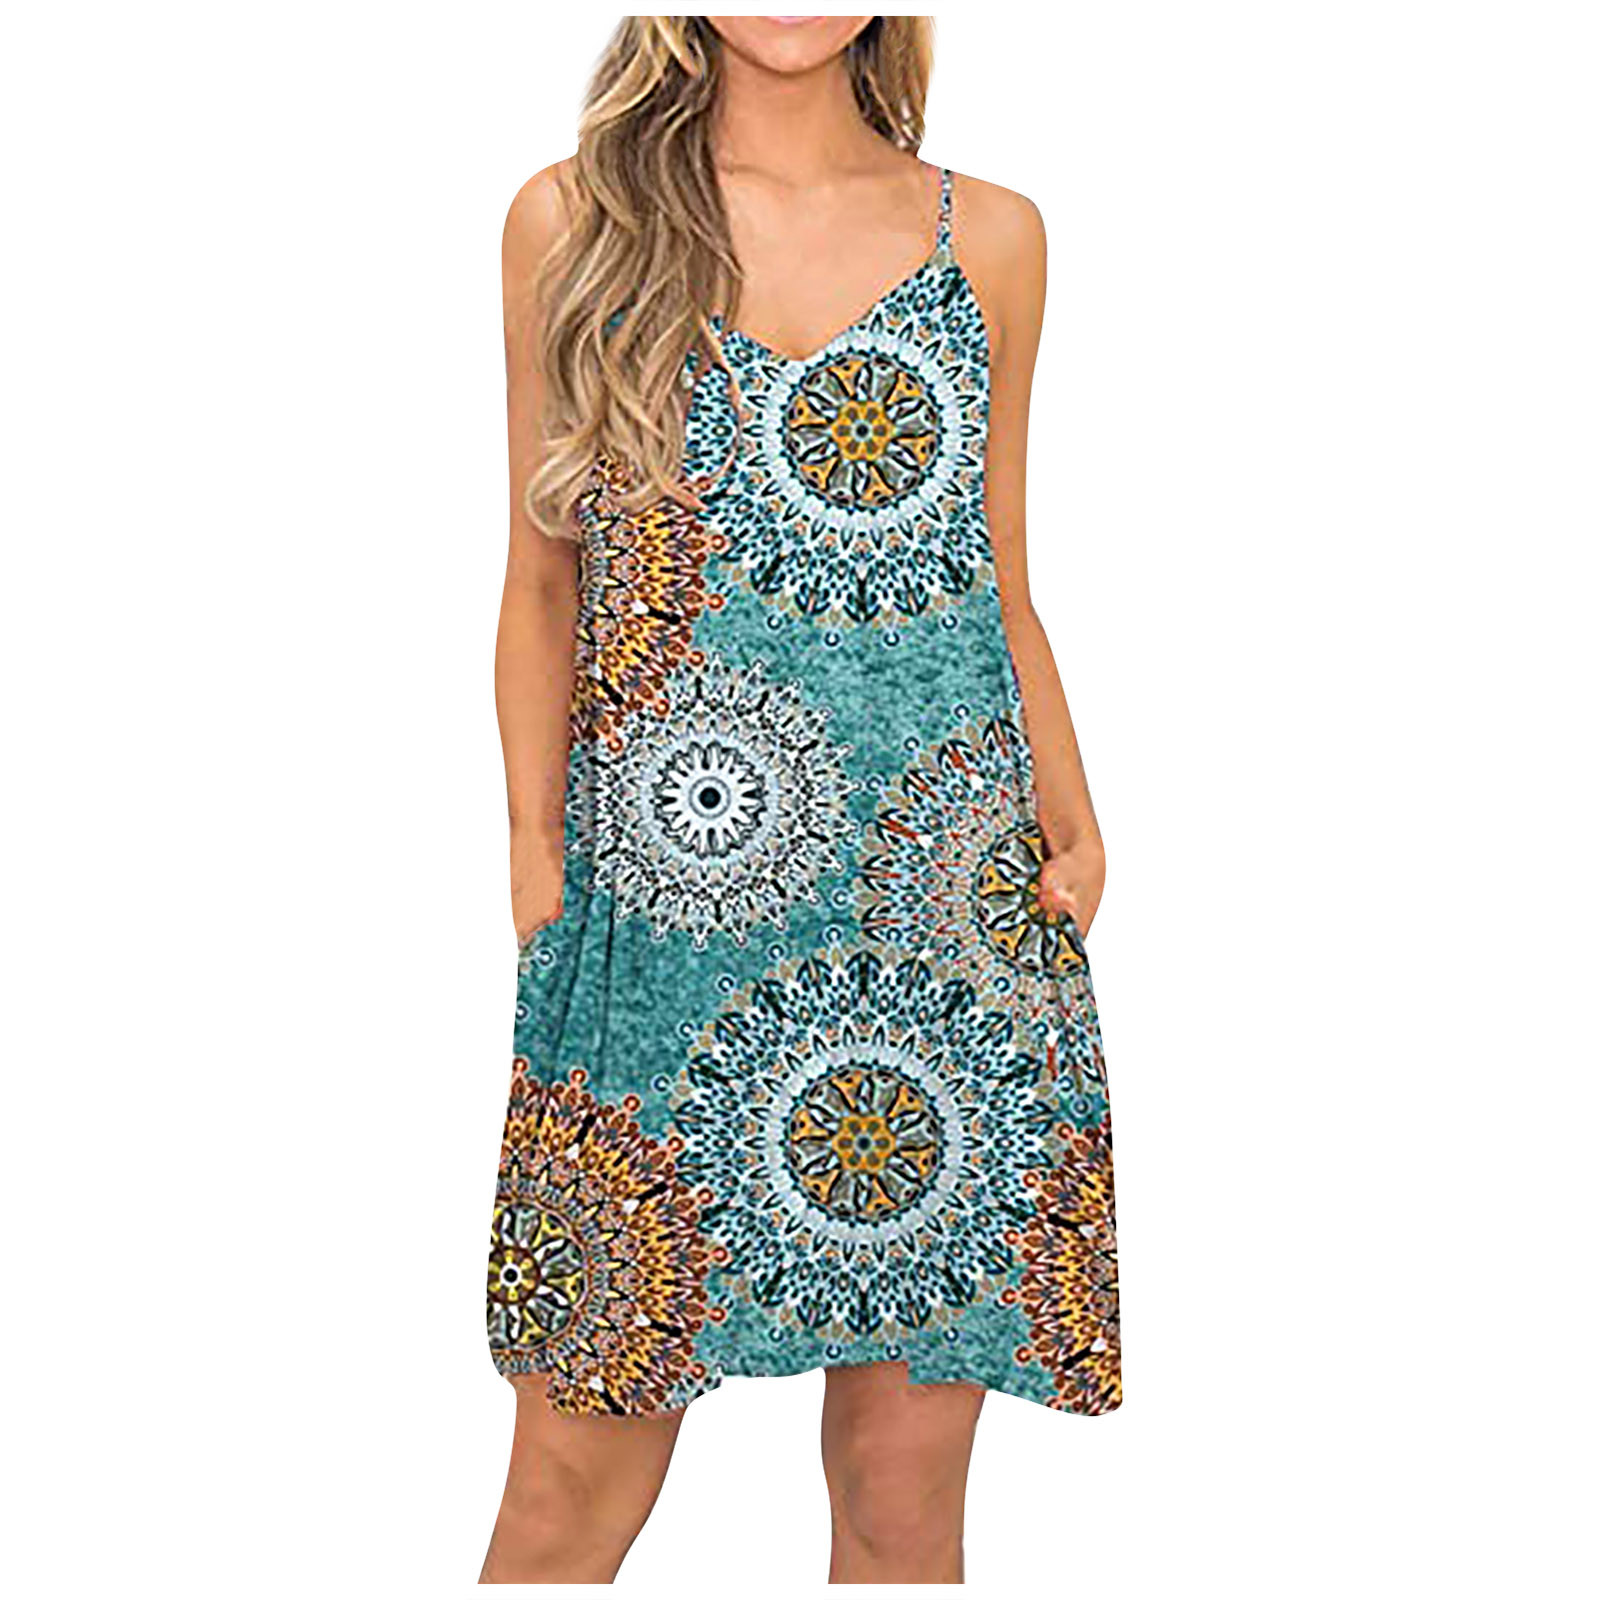 Women Summer Casual Fashion Beach Cover Up Plain Pleated Tank Slip Dress Vestido De Mujer